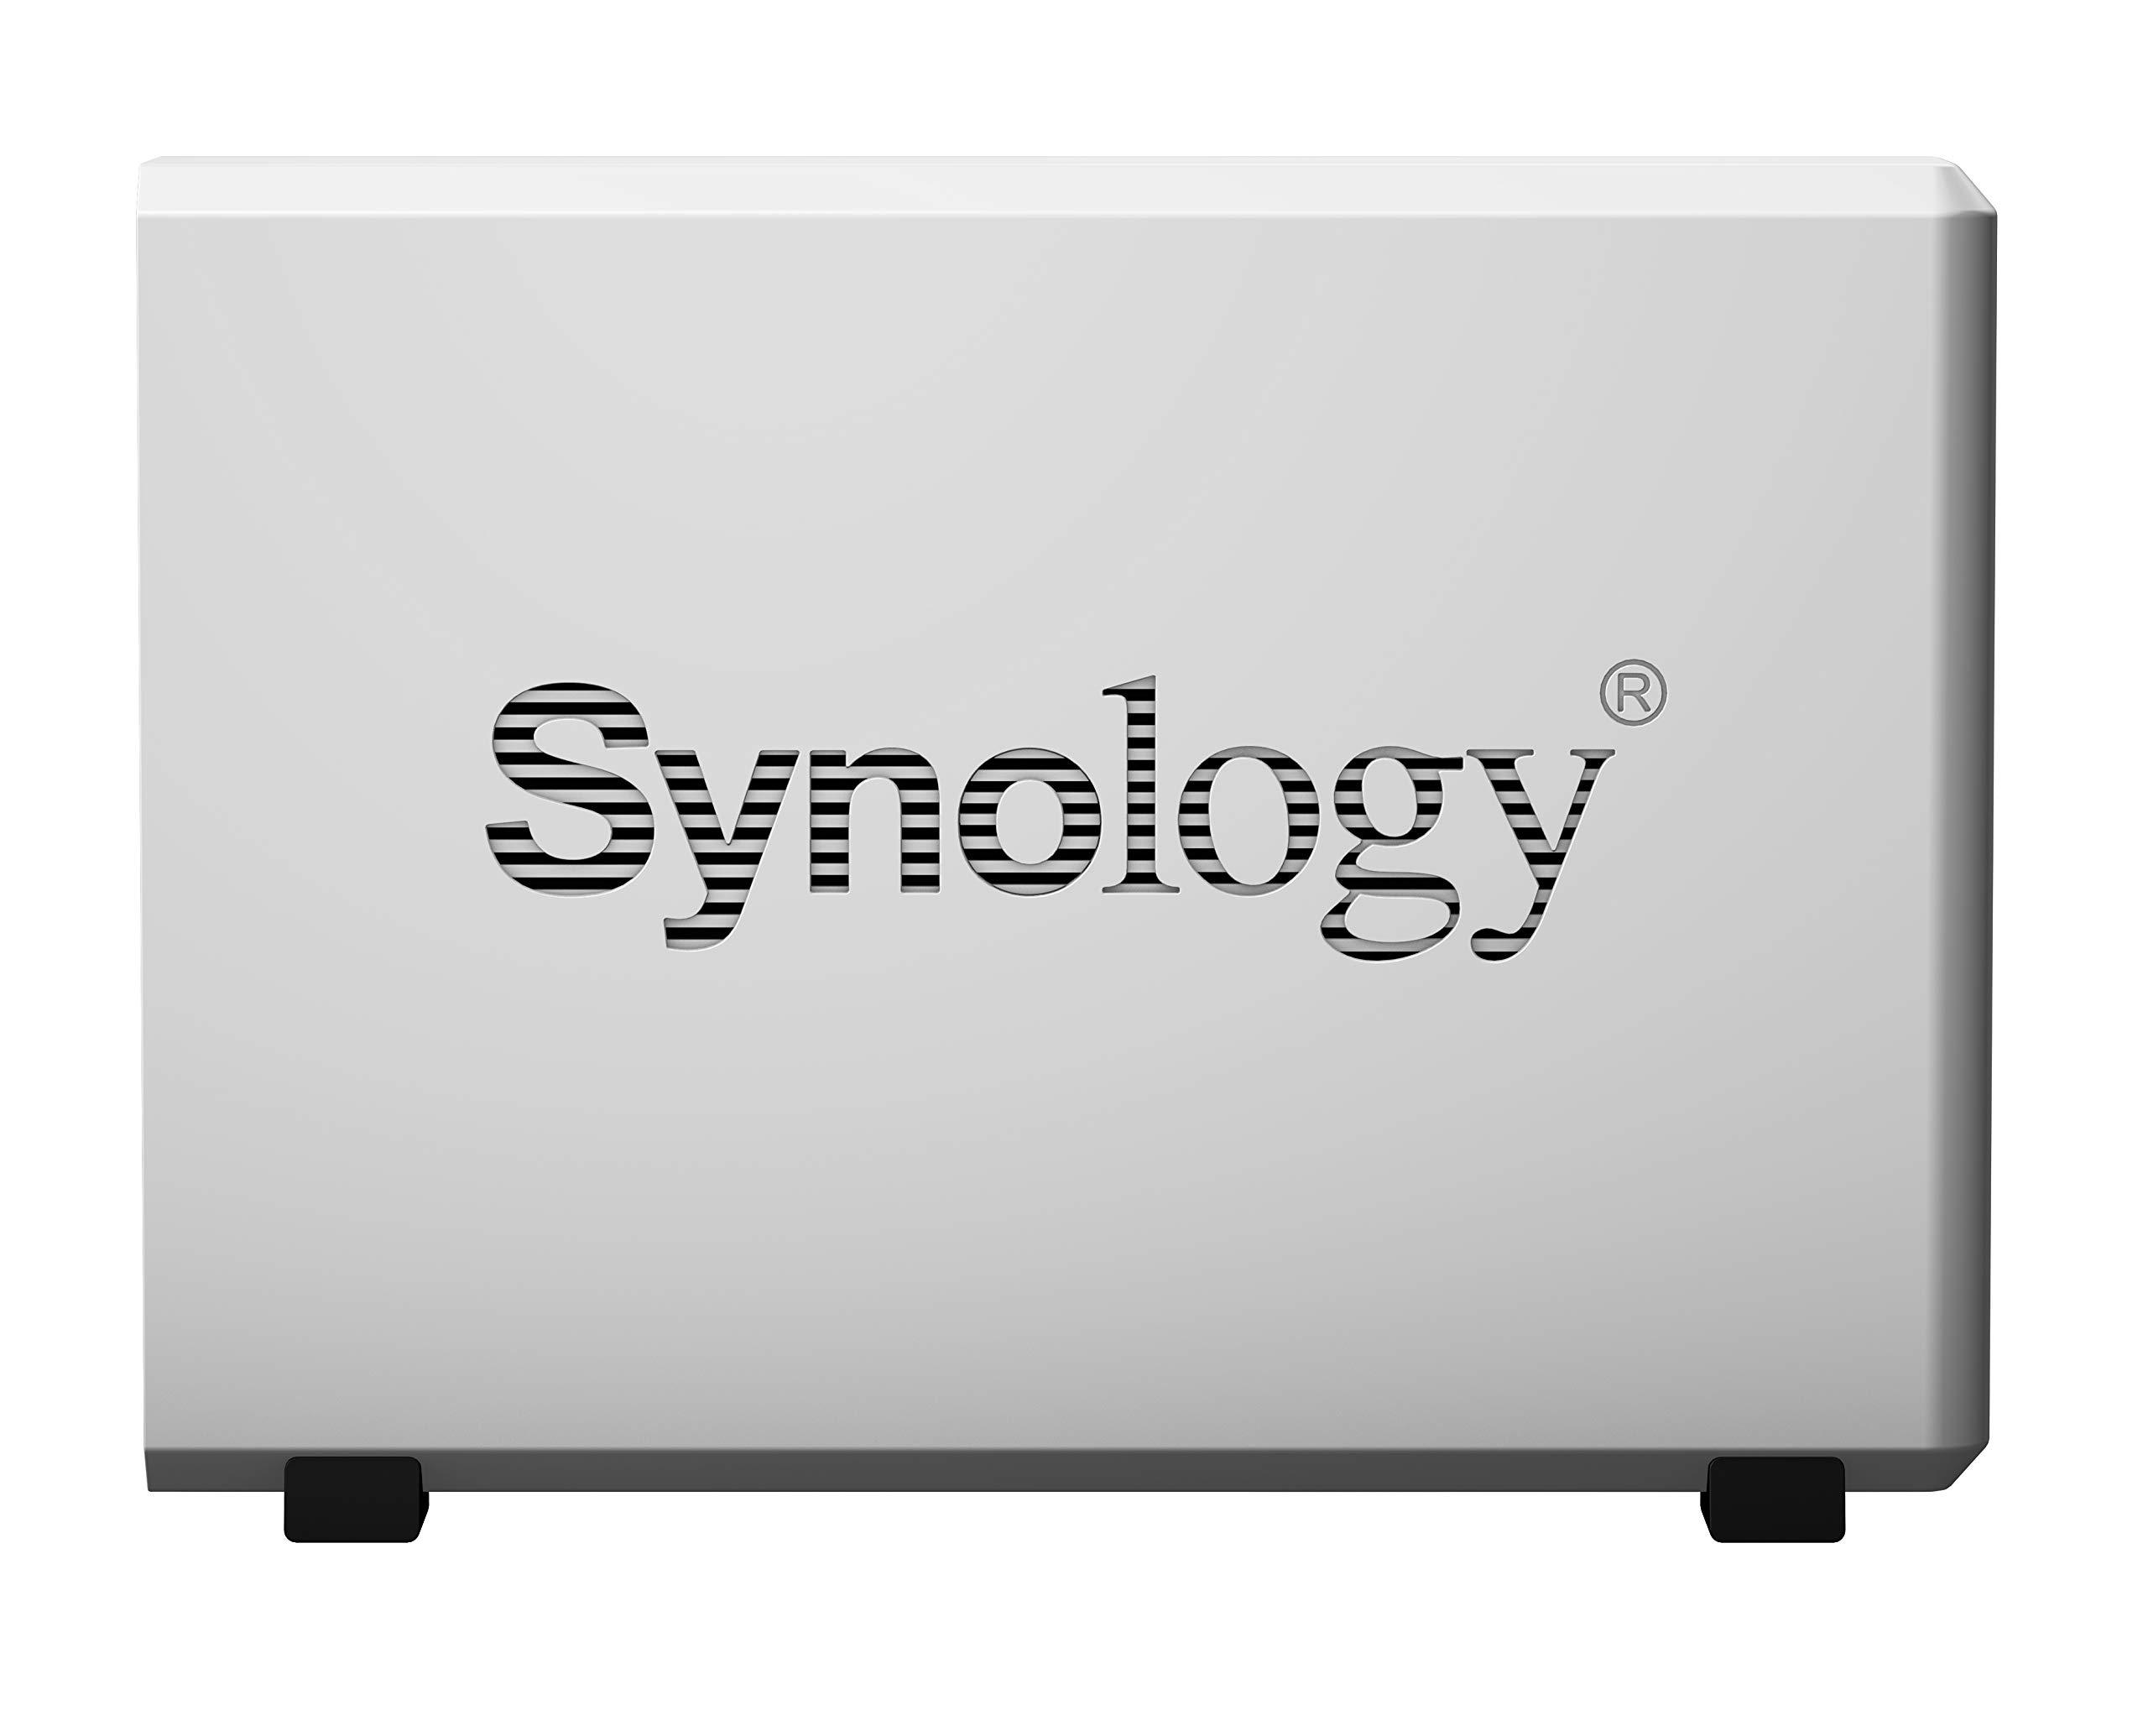 Synology 1 Bay NAS DiskStation (DS119j), 1-Bay; 256MB DDR3L by Synology (Image #3)